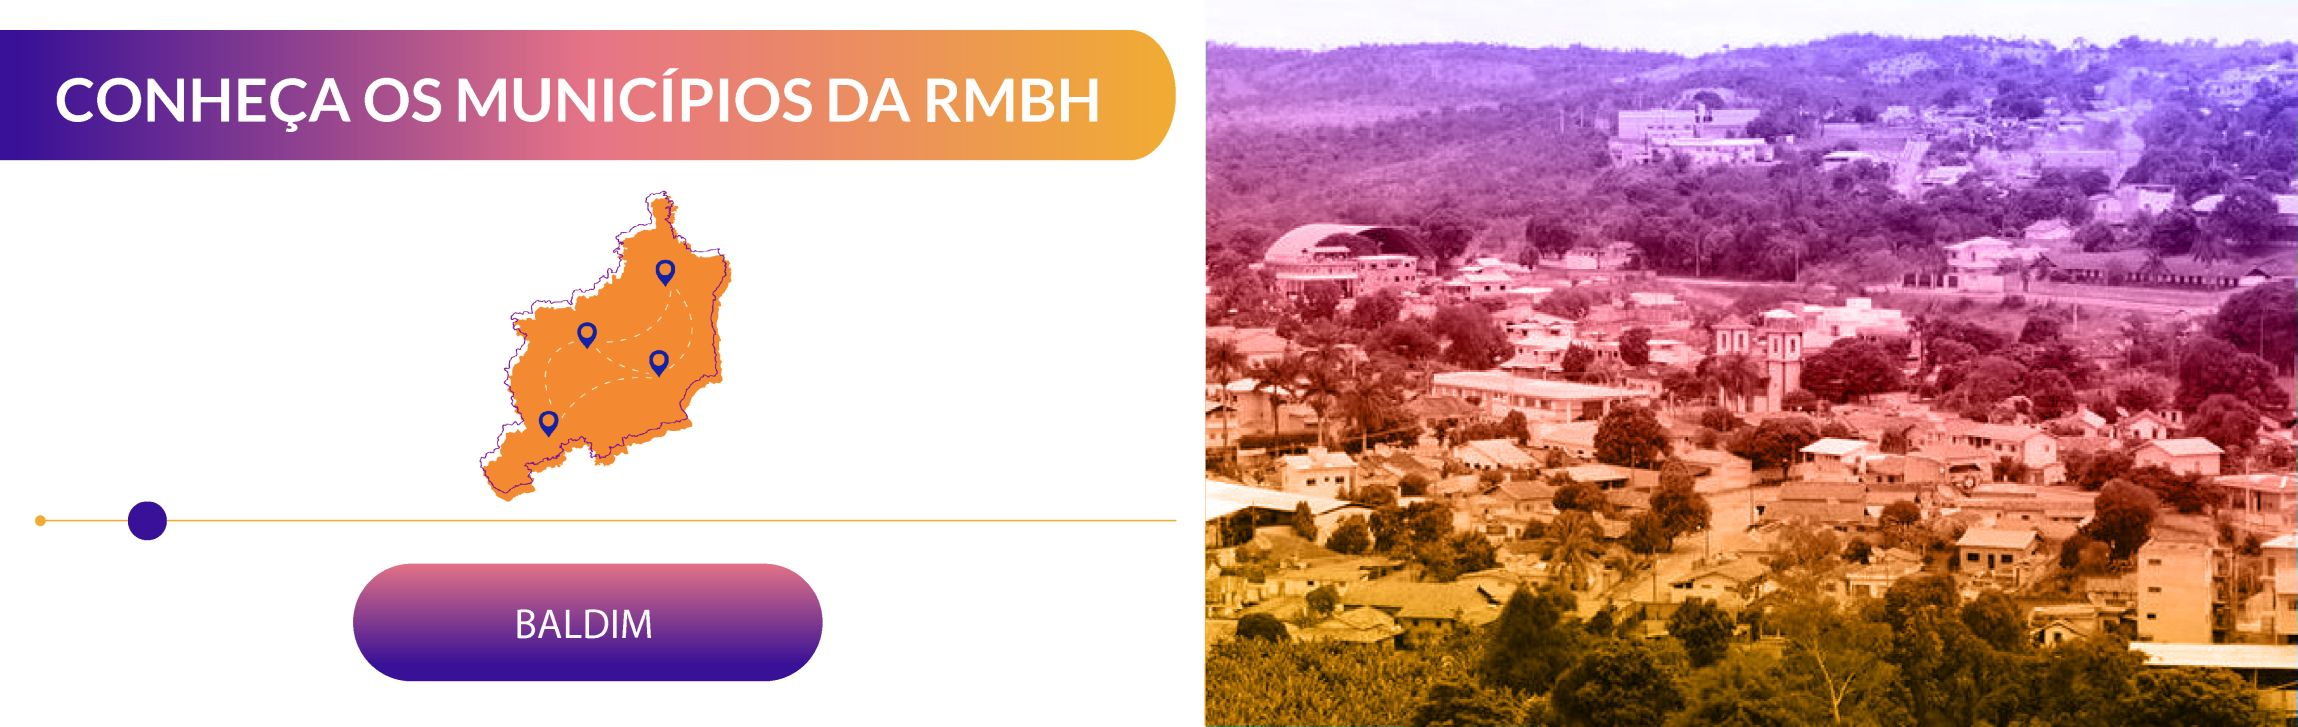 banner-municipio-baldim-01